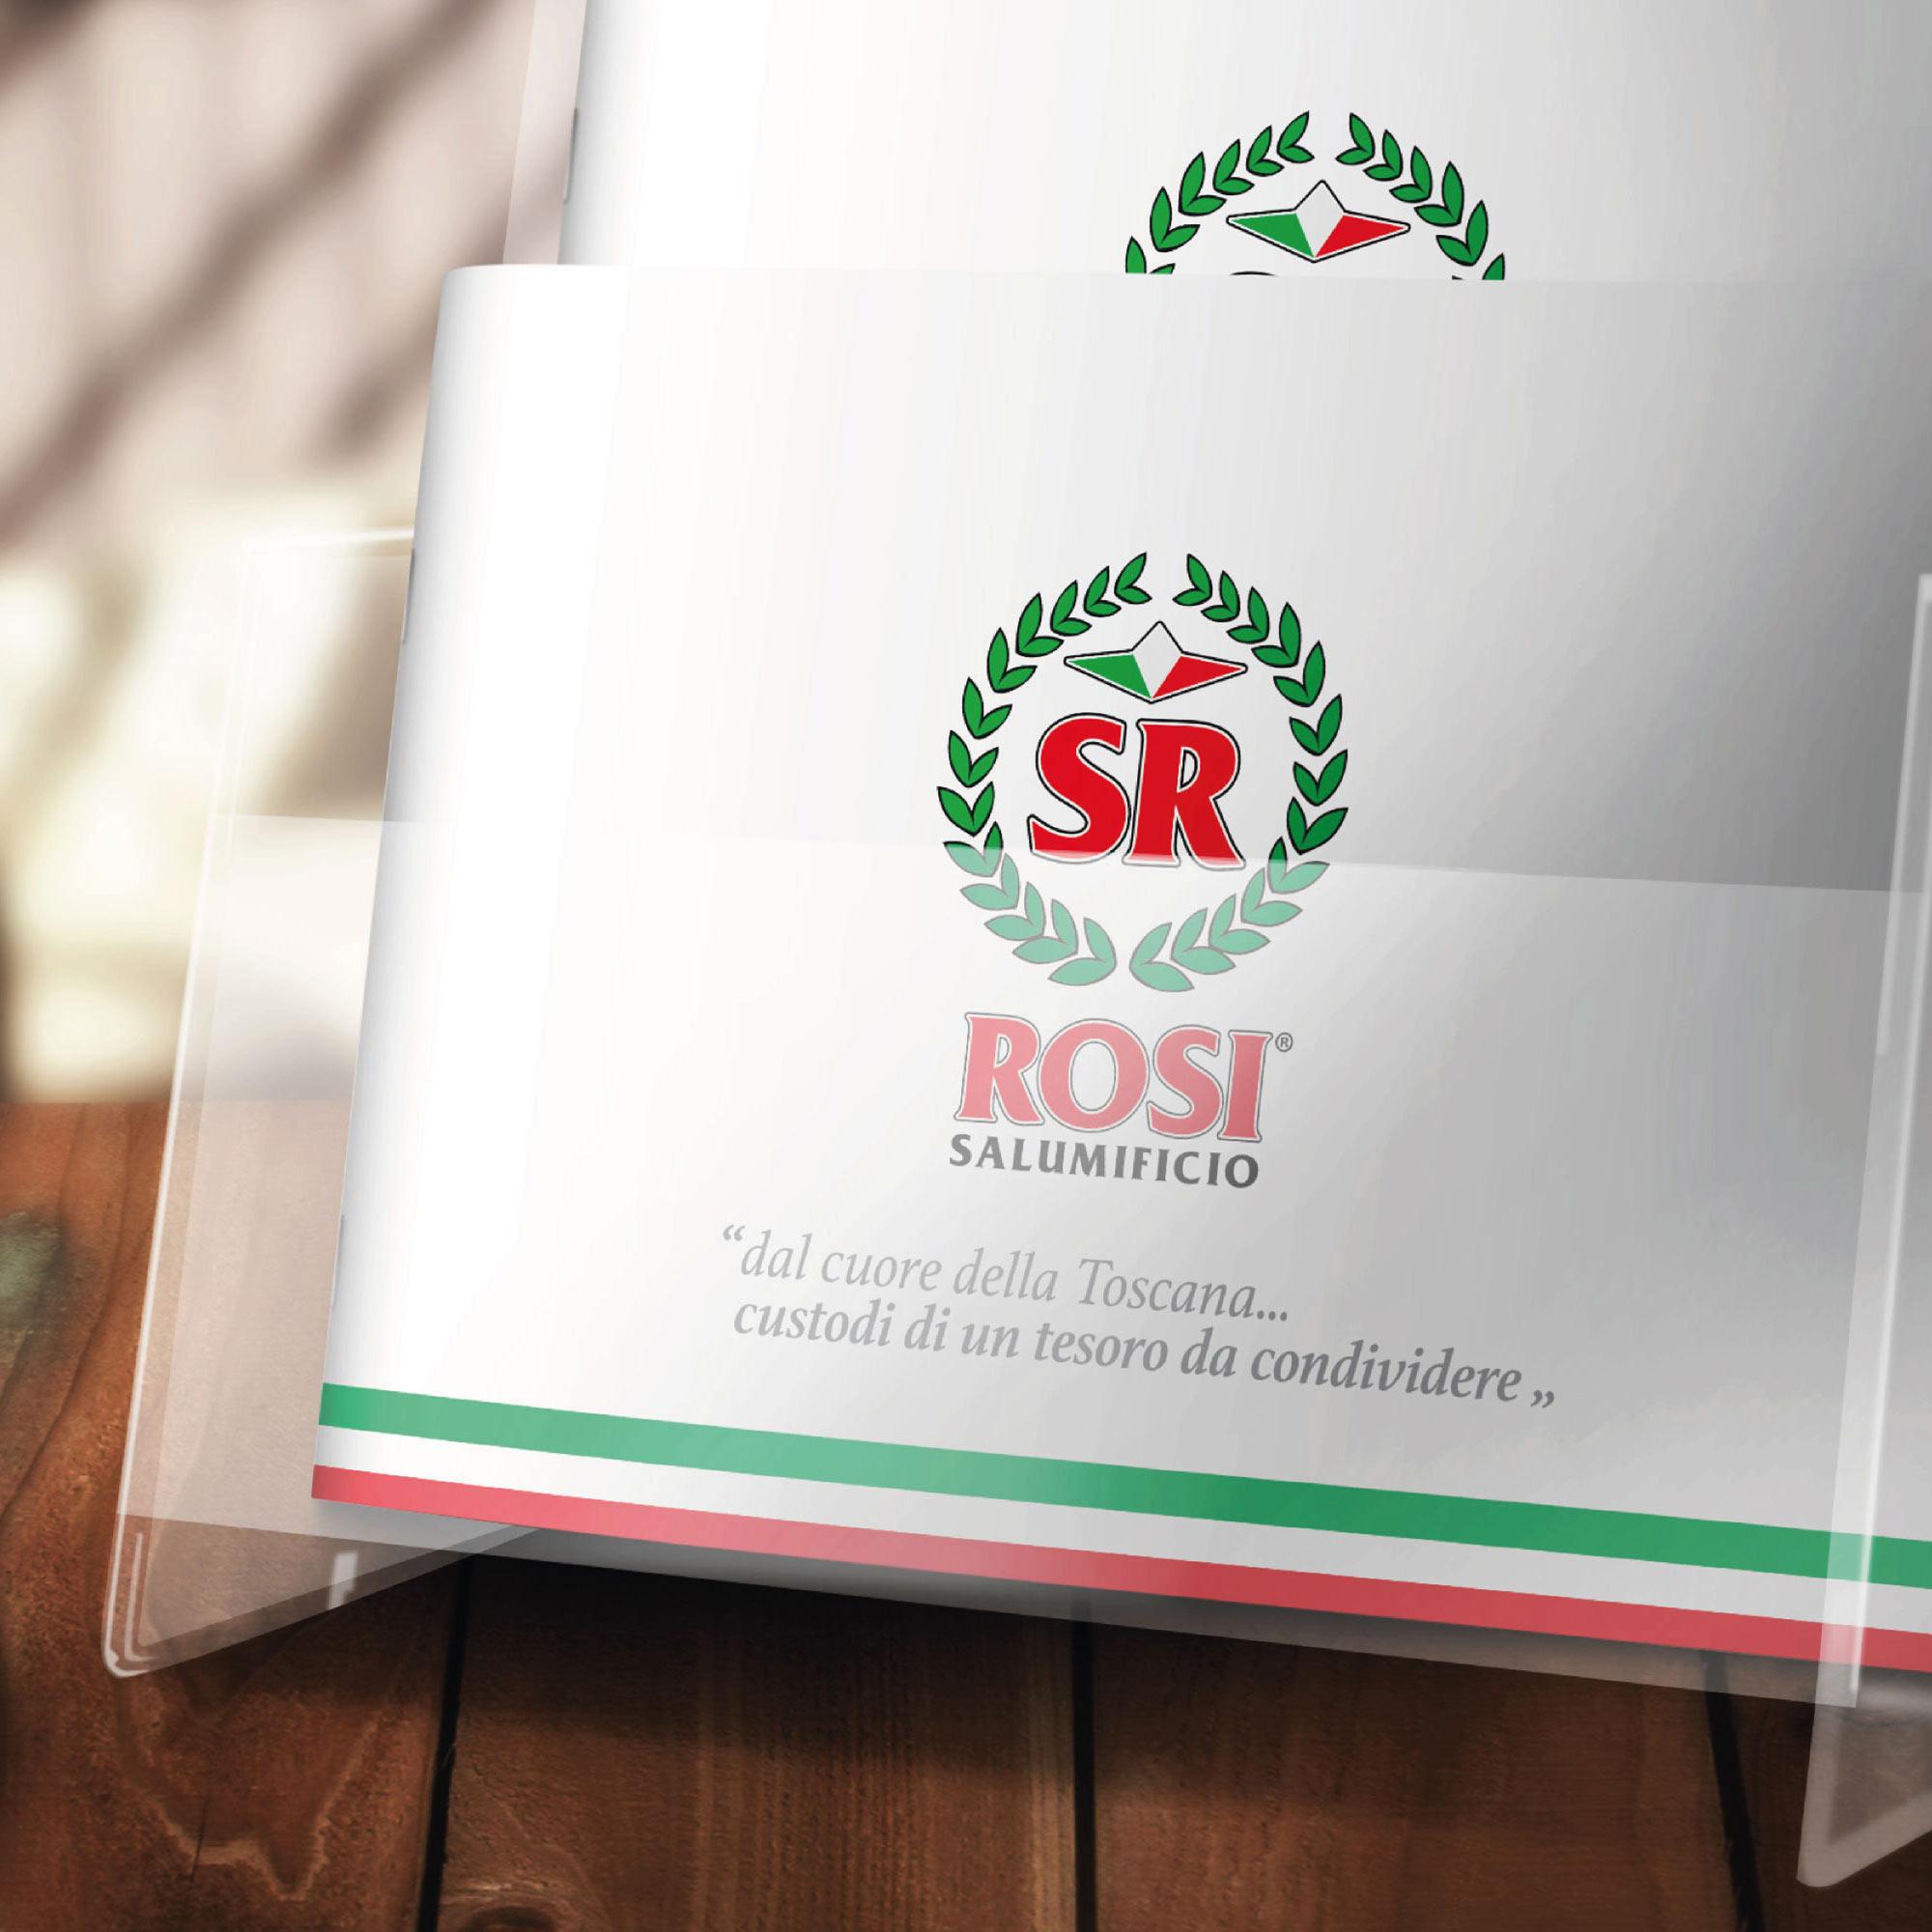 Rosi Salumificio – Folder